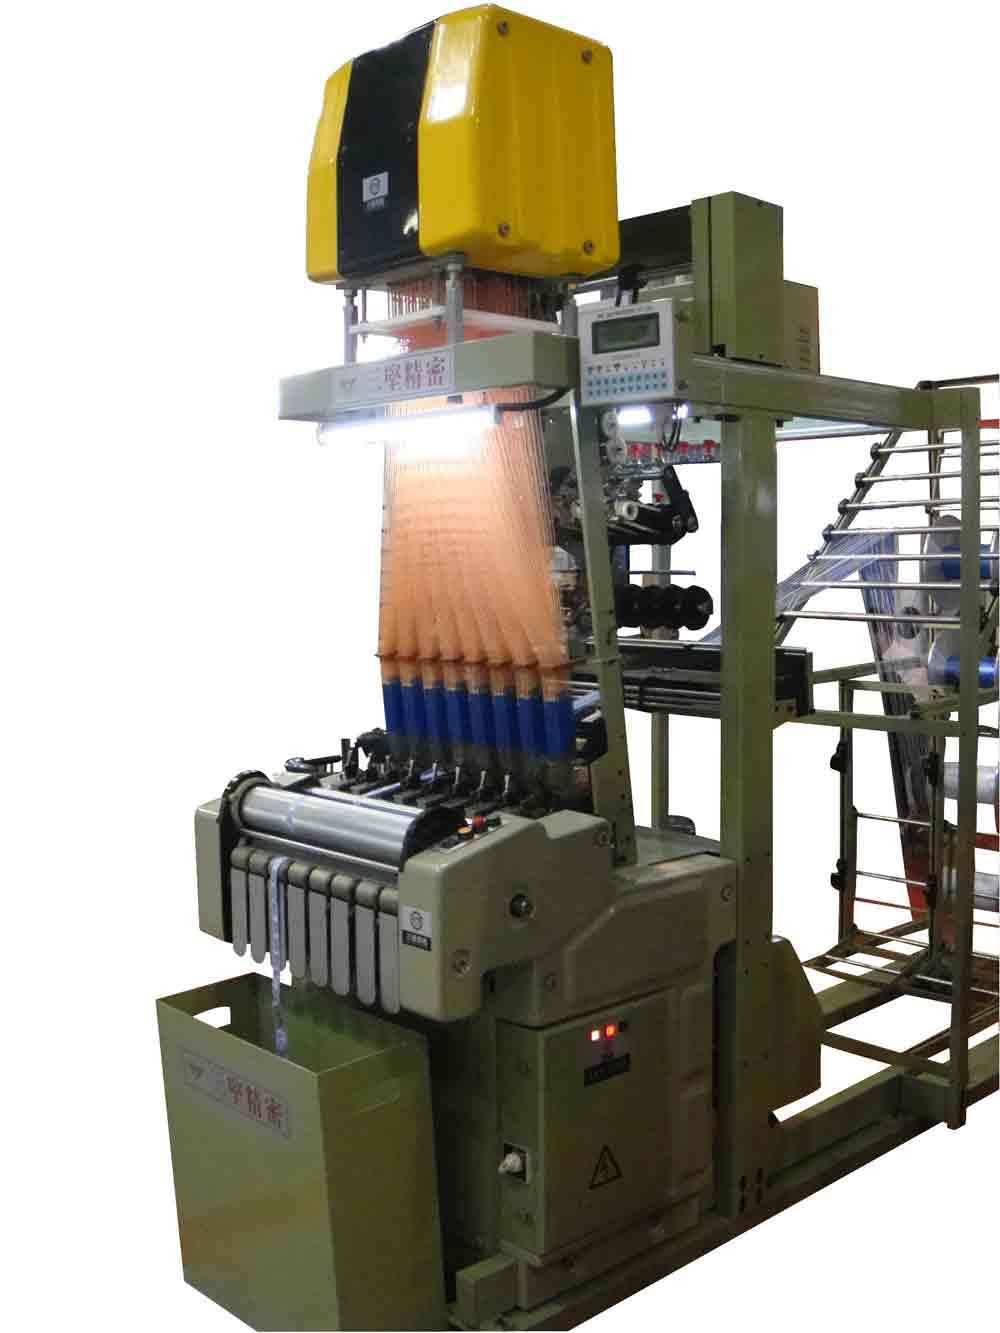 ... Jacquard Loom (SJFAVM8/35/192) - China Jacquard Loom, Needle Loom